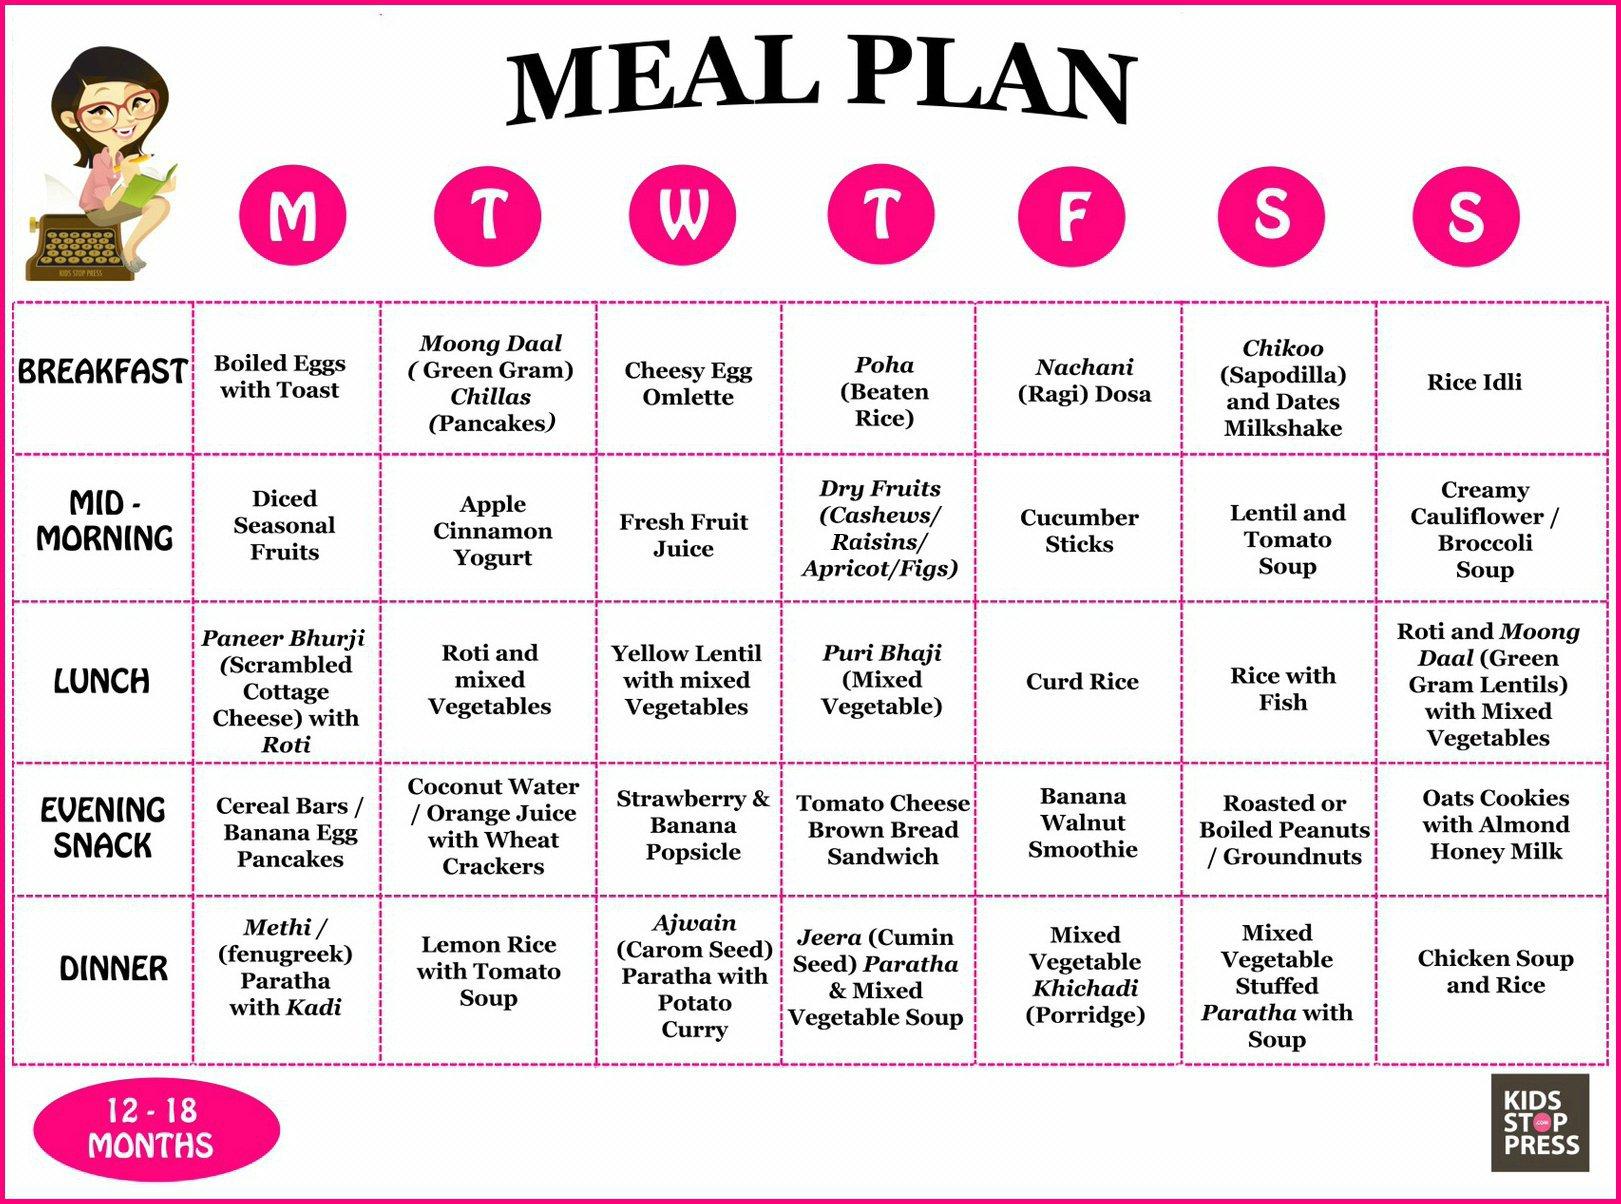 Diet Plan For 9 Month Old Baby - Diet Plan